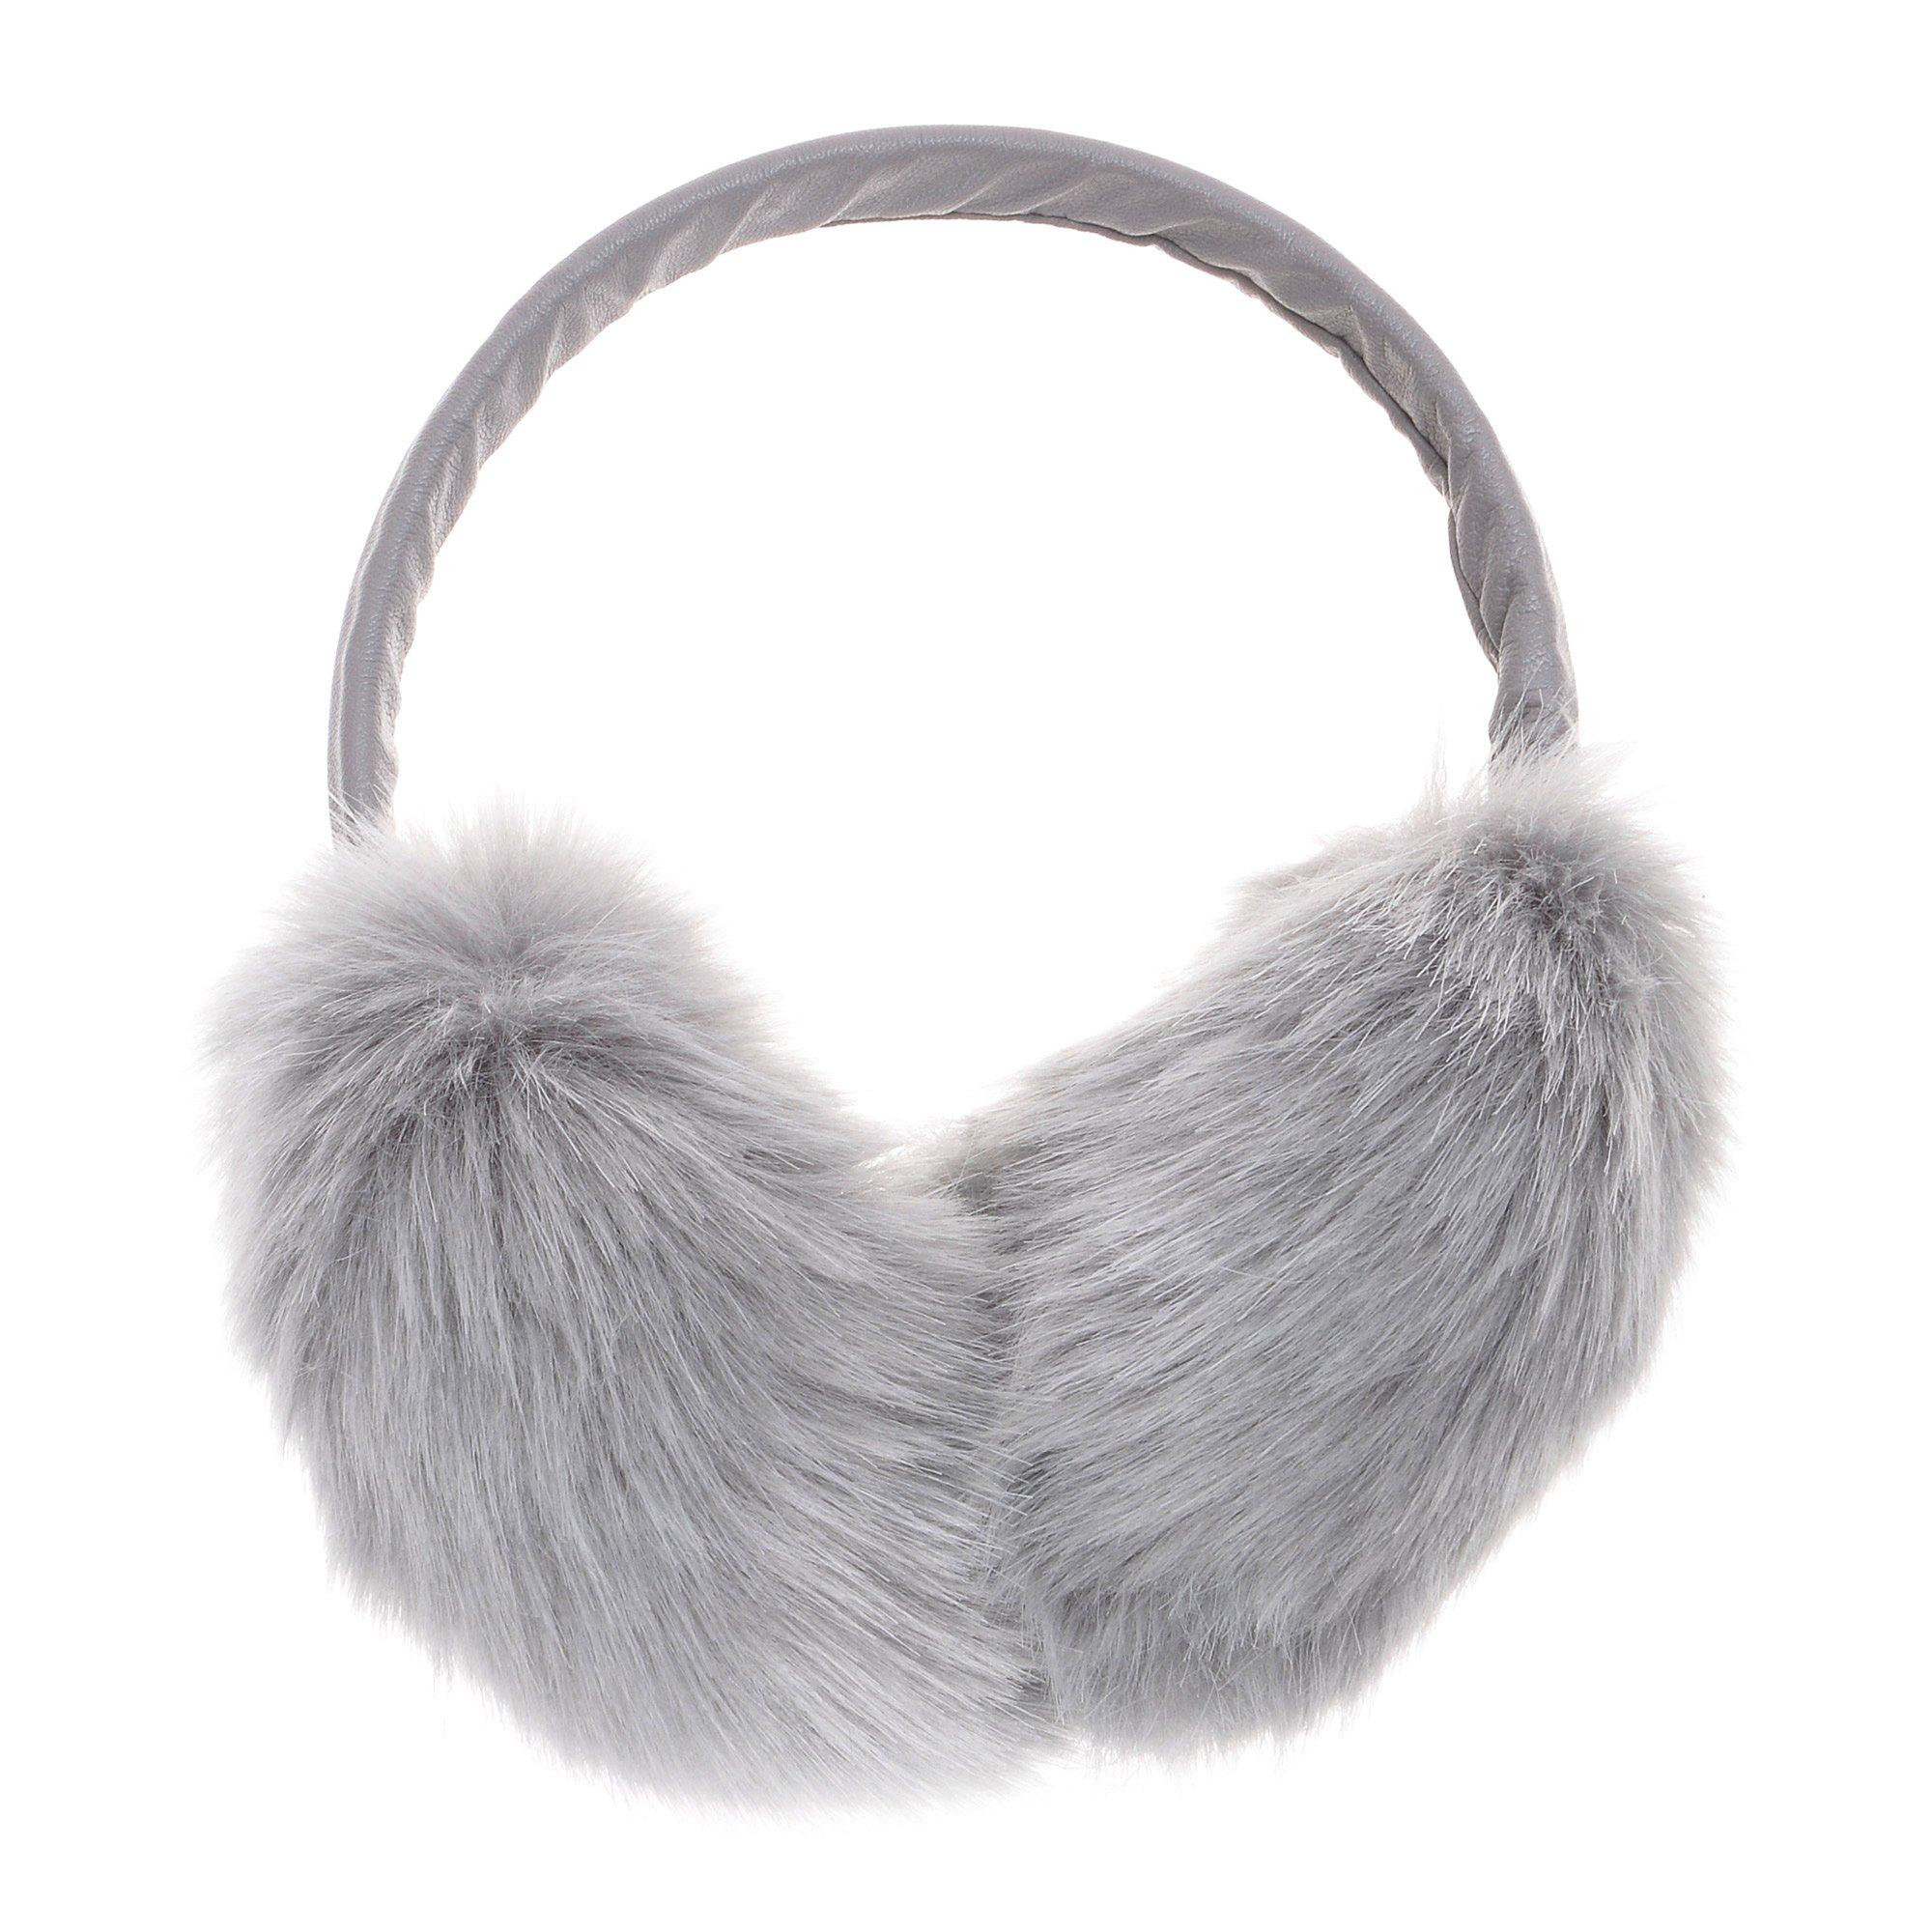 ZLYC Womens Girls Winter Fashion Adjustable Faux Fur EarMuffs Big Ear Warmers(Gray)